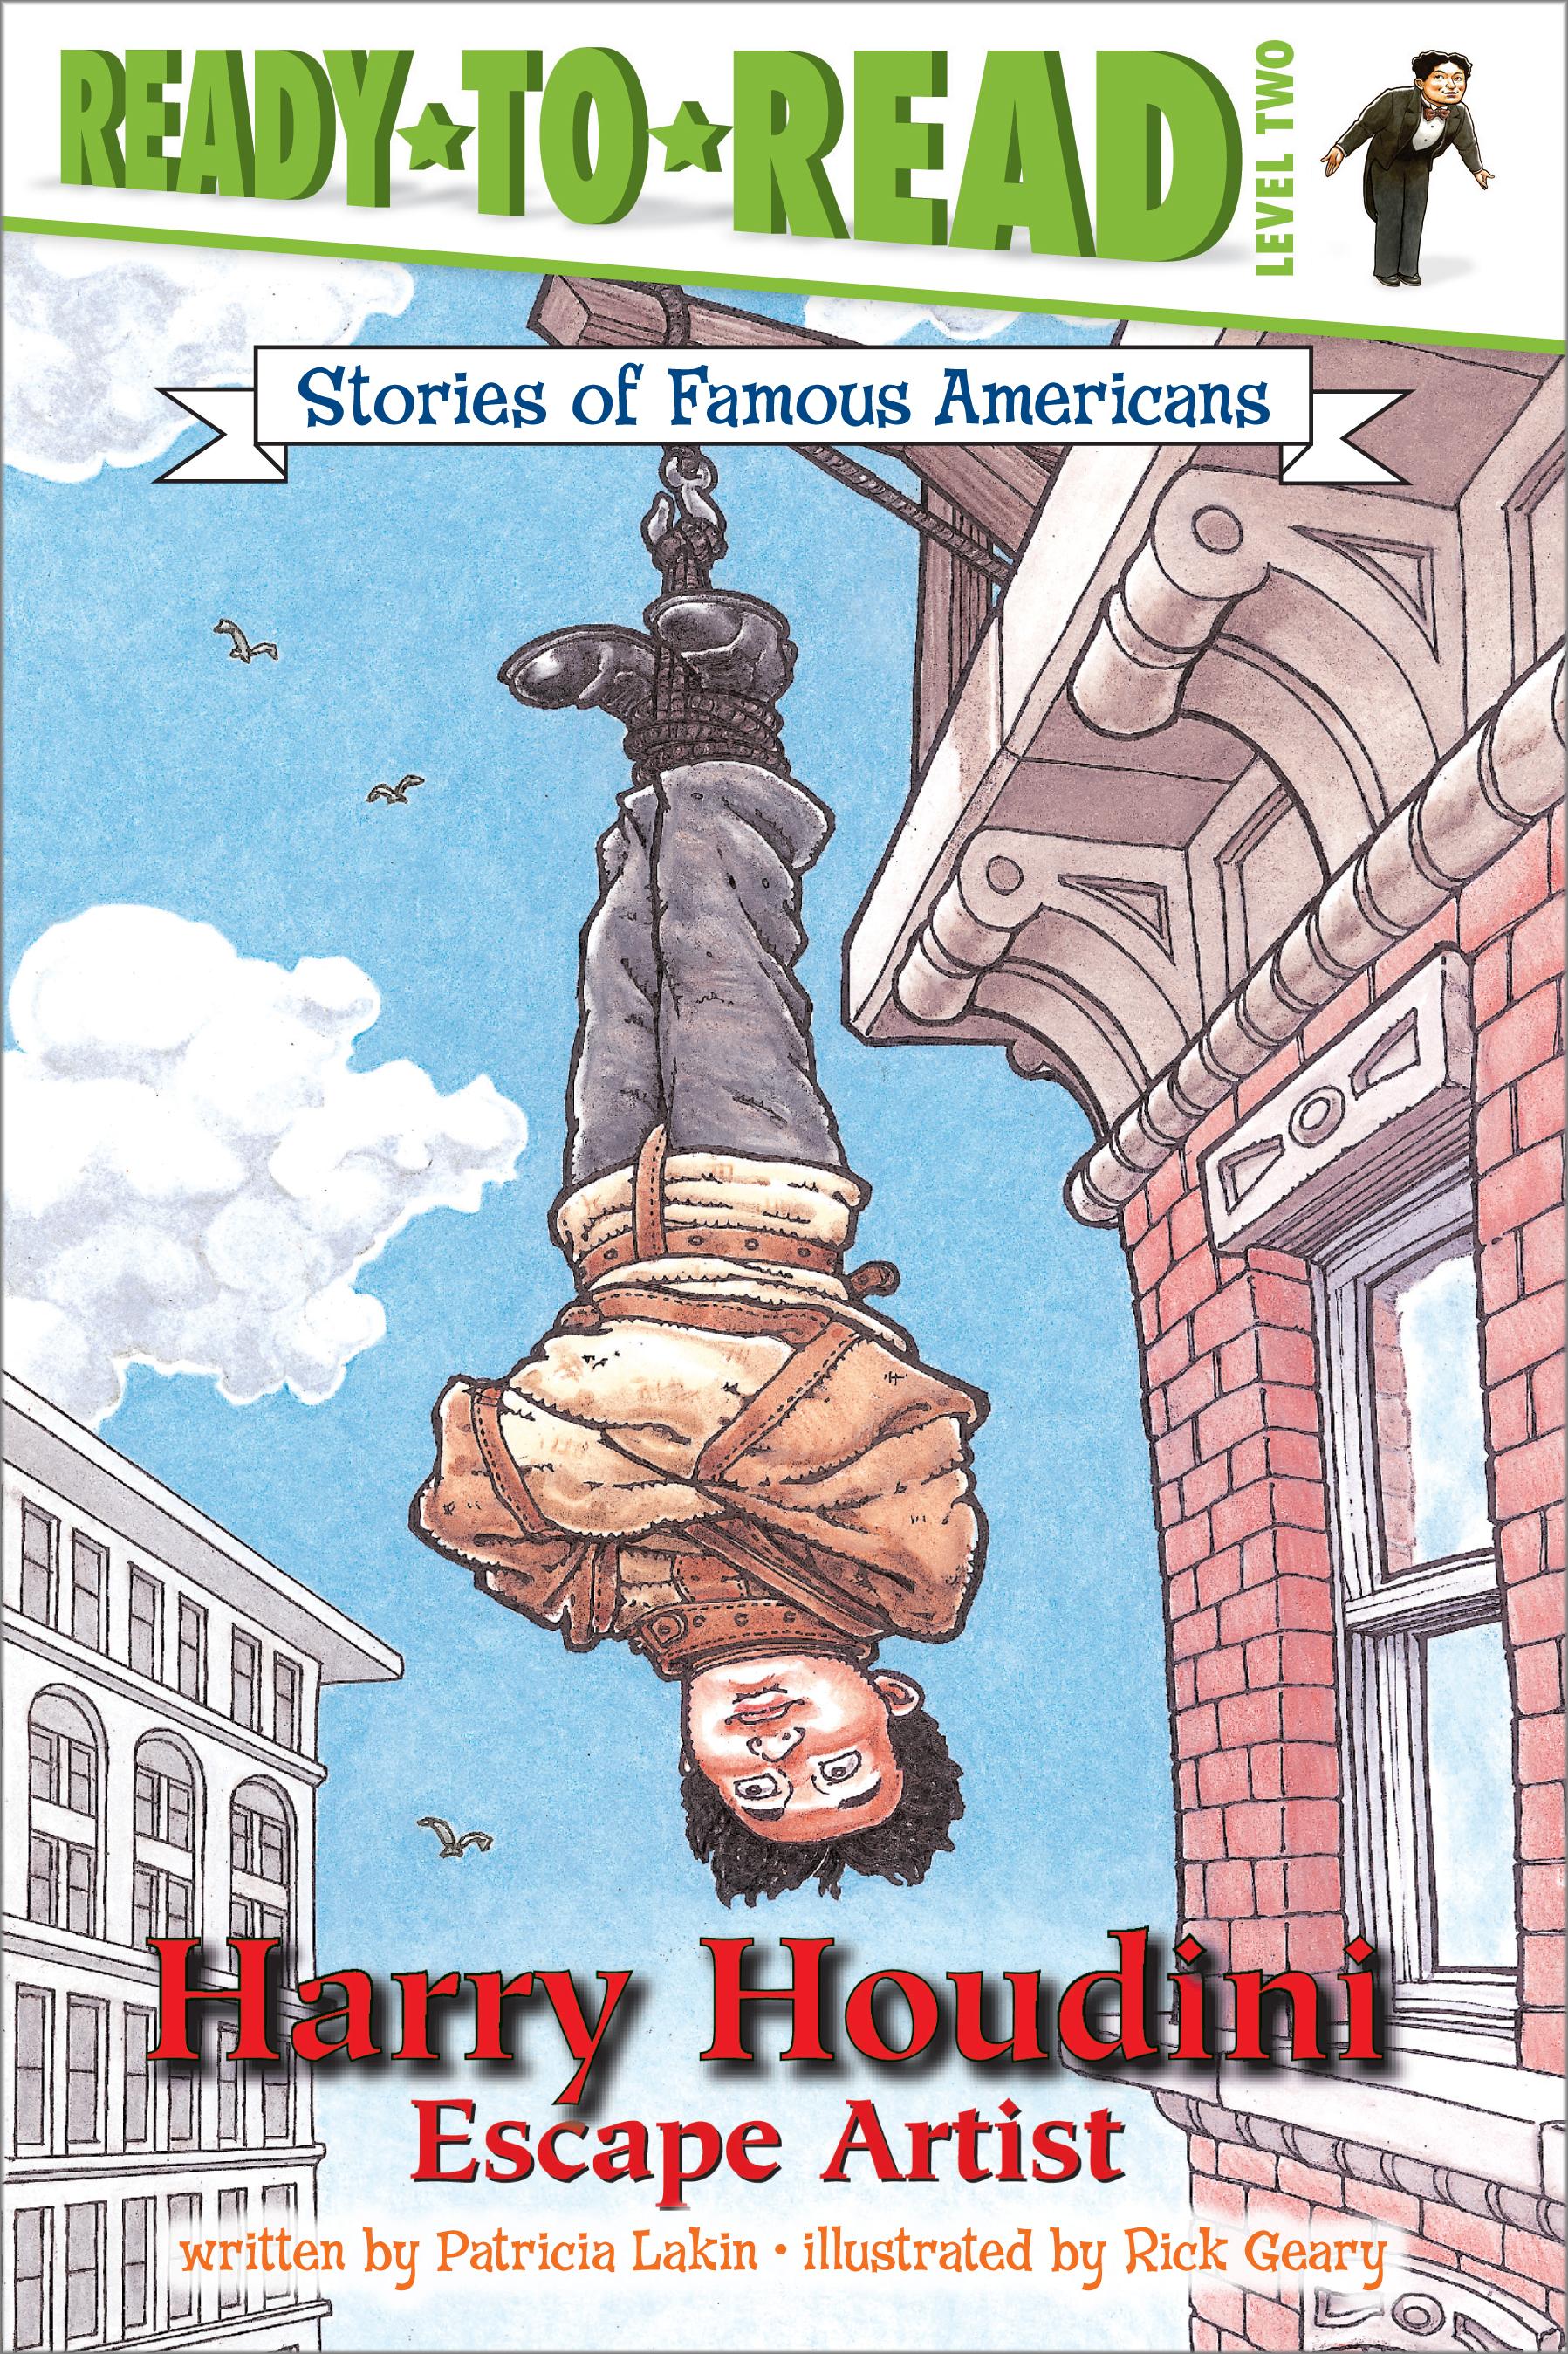 Harry Houdini | Book by Patricia Lakin, Rick Geary